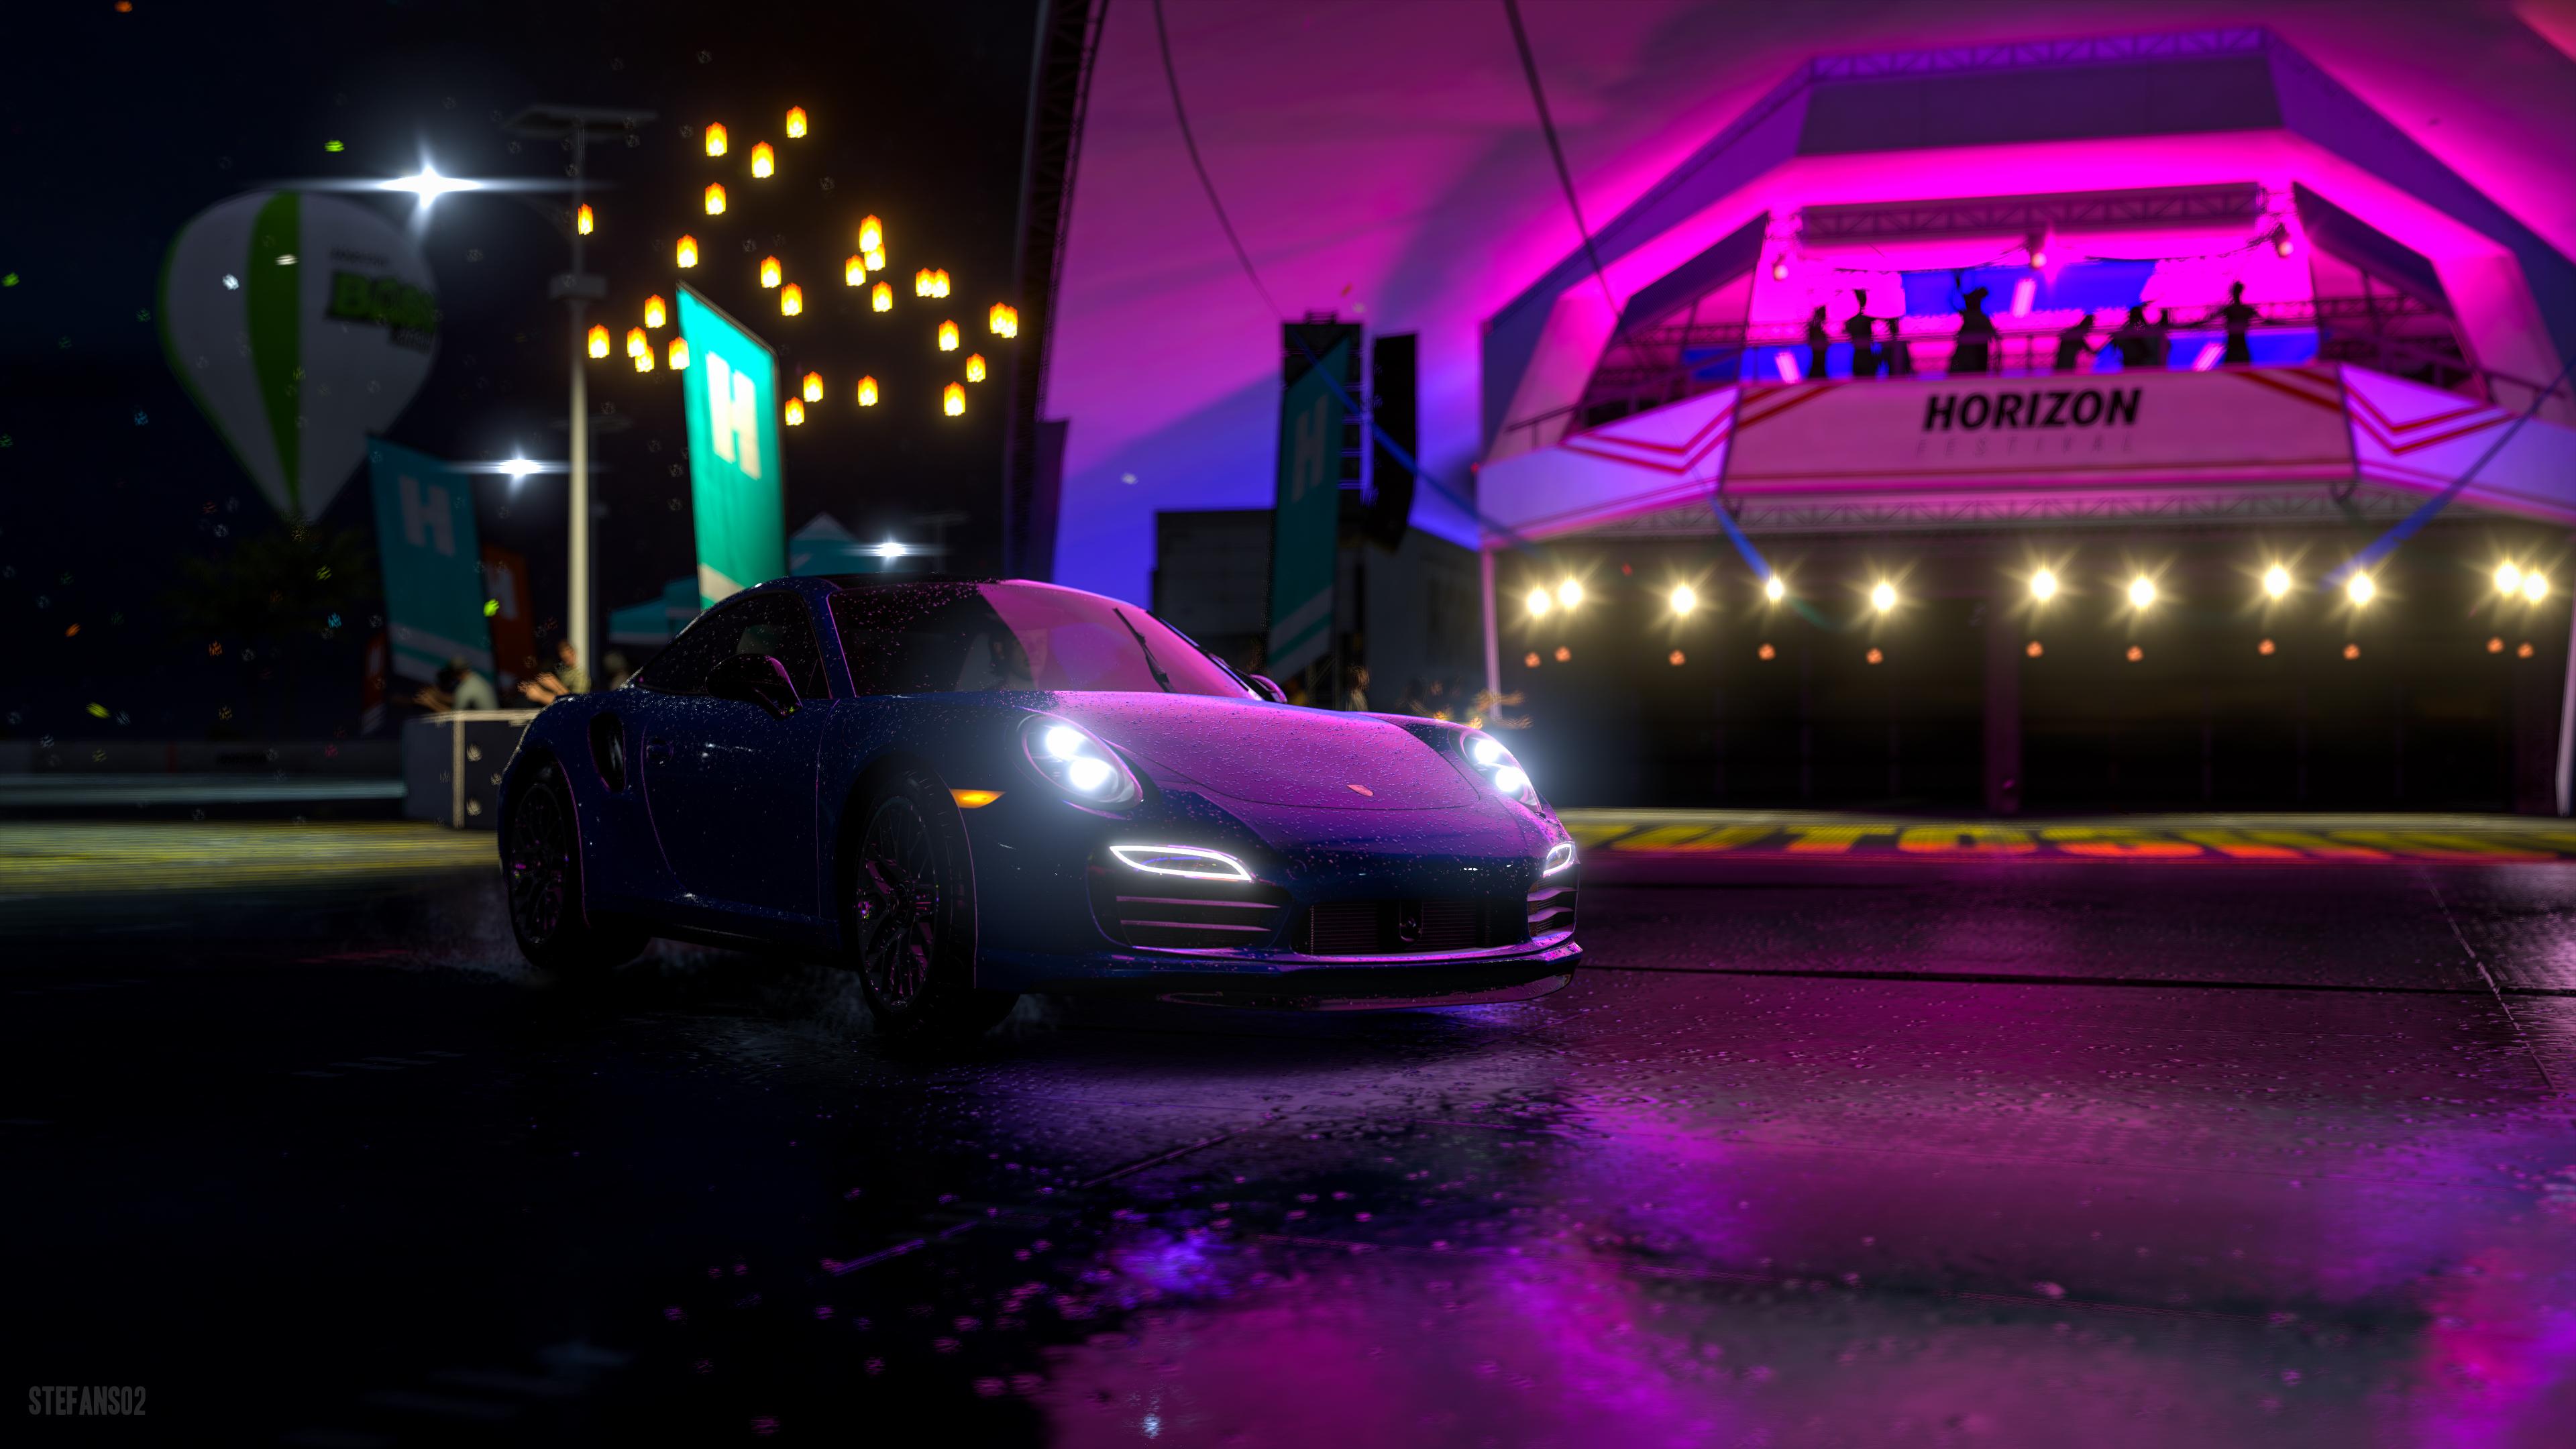 Forza Horizon 3 Porsche 911 Hd 4k Wallpaper